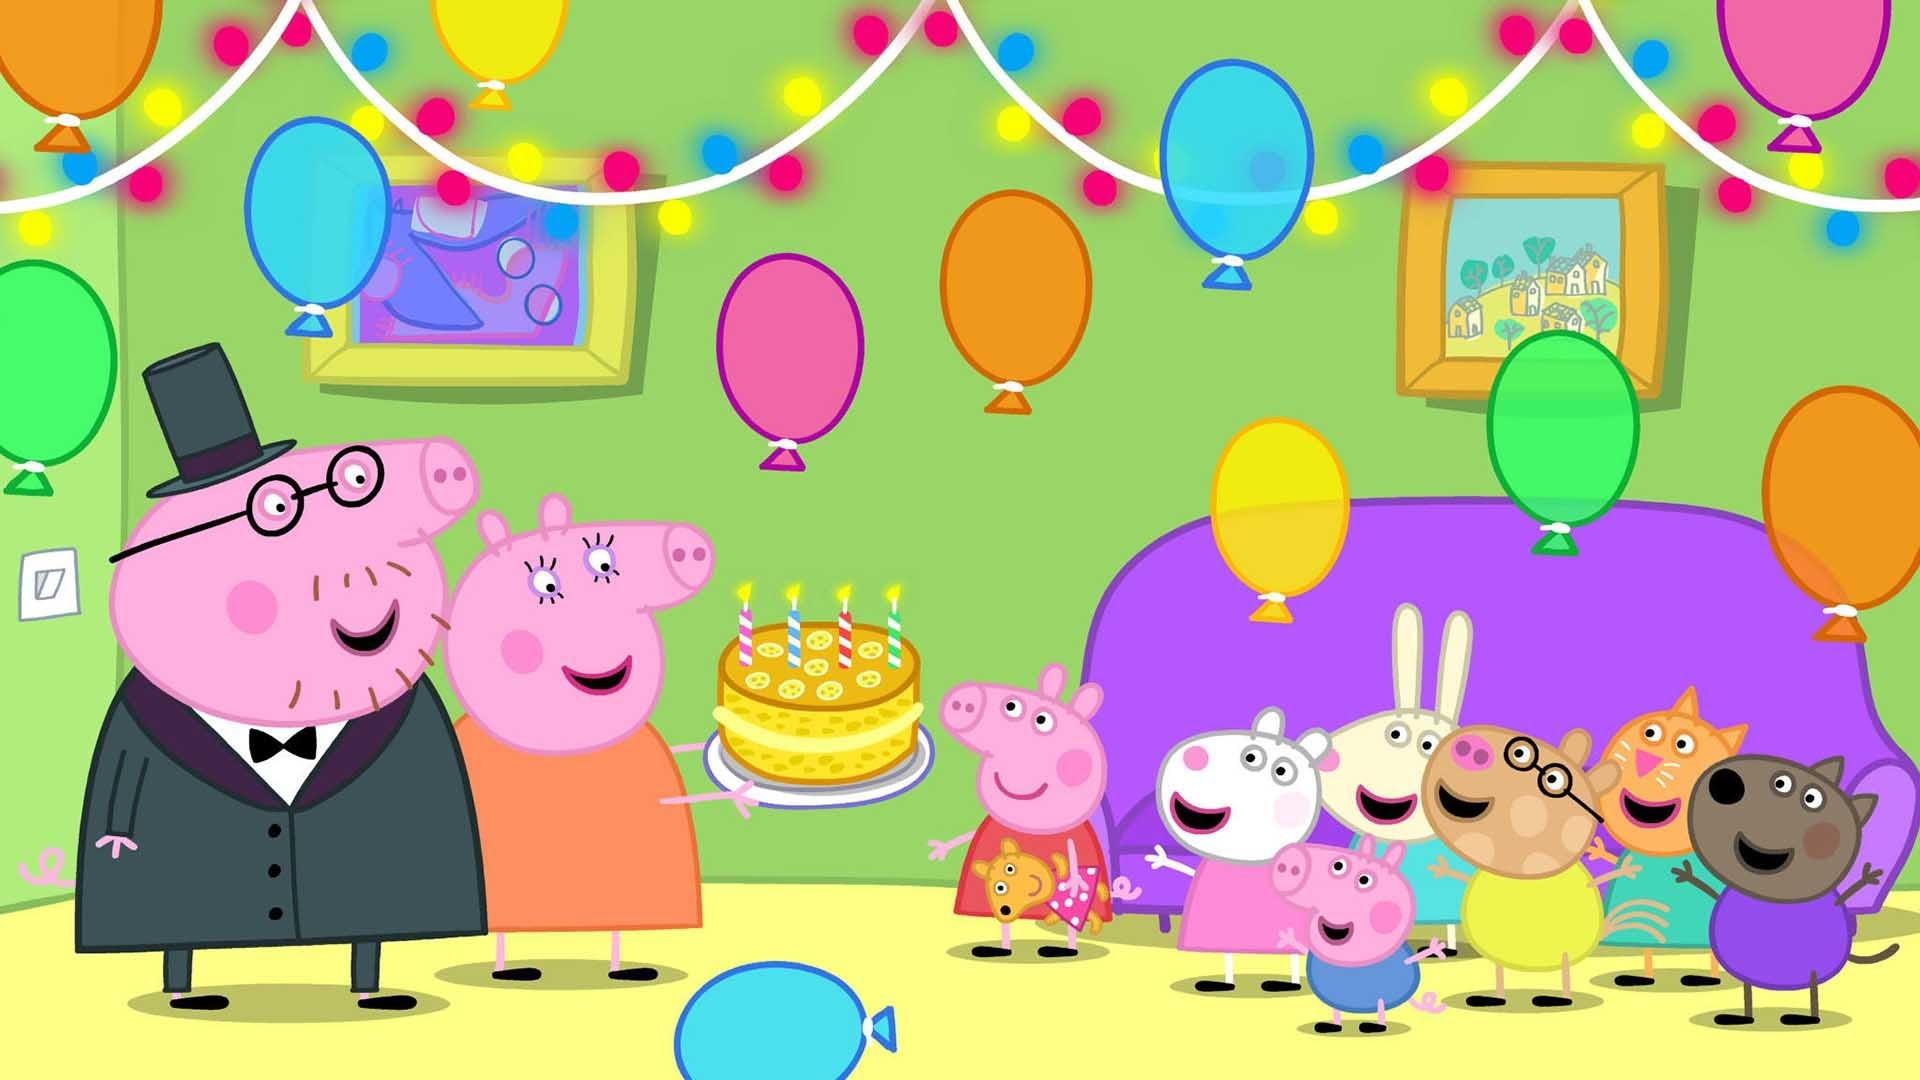 Peppa pig world! Peppa pig videos! peppapig movie! Peppa pig birthday party  2016 – YouTube